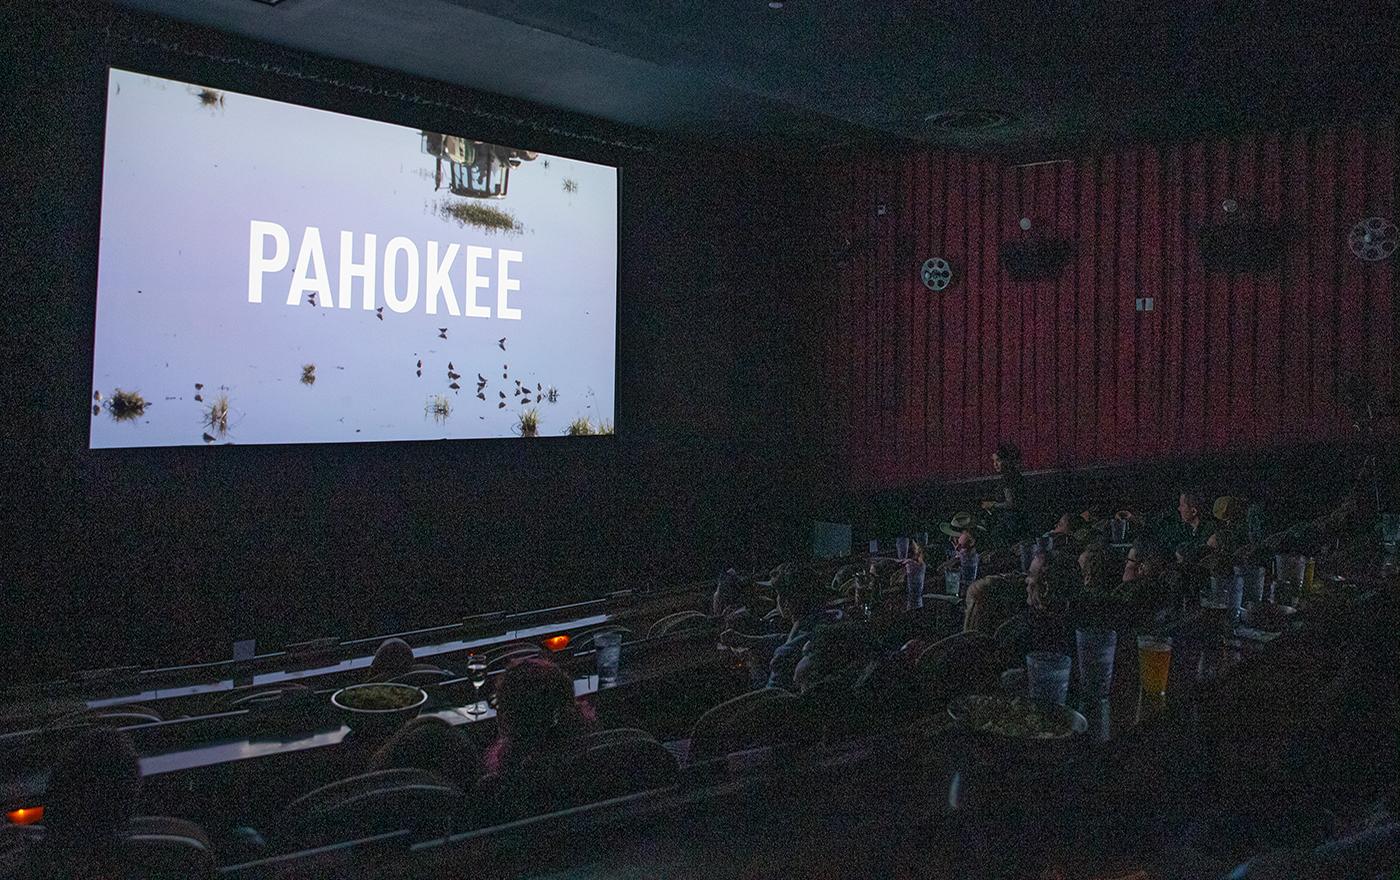 SXSW EDU 2019 Pahokee film photo by SteveRogers